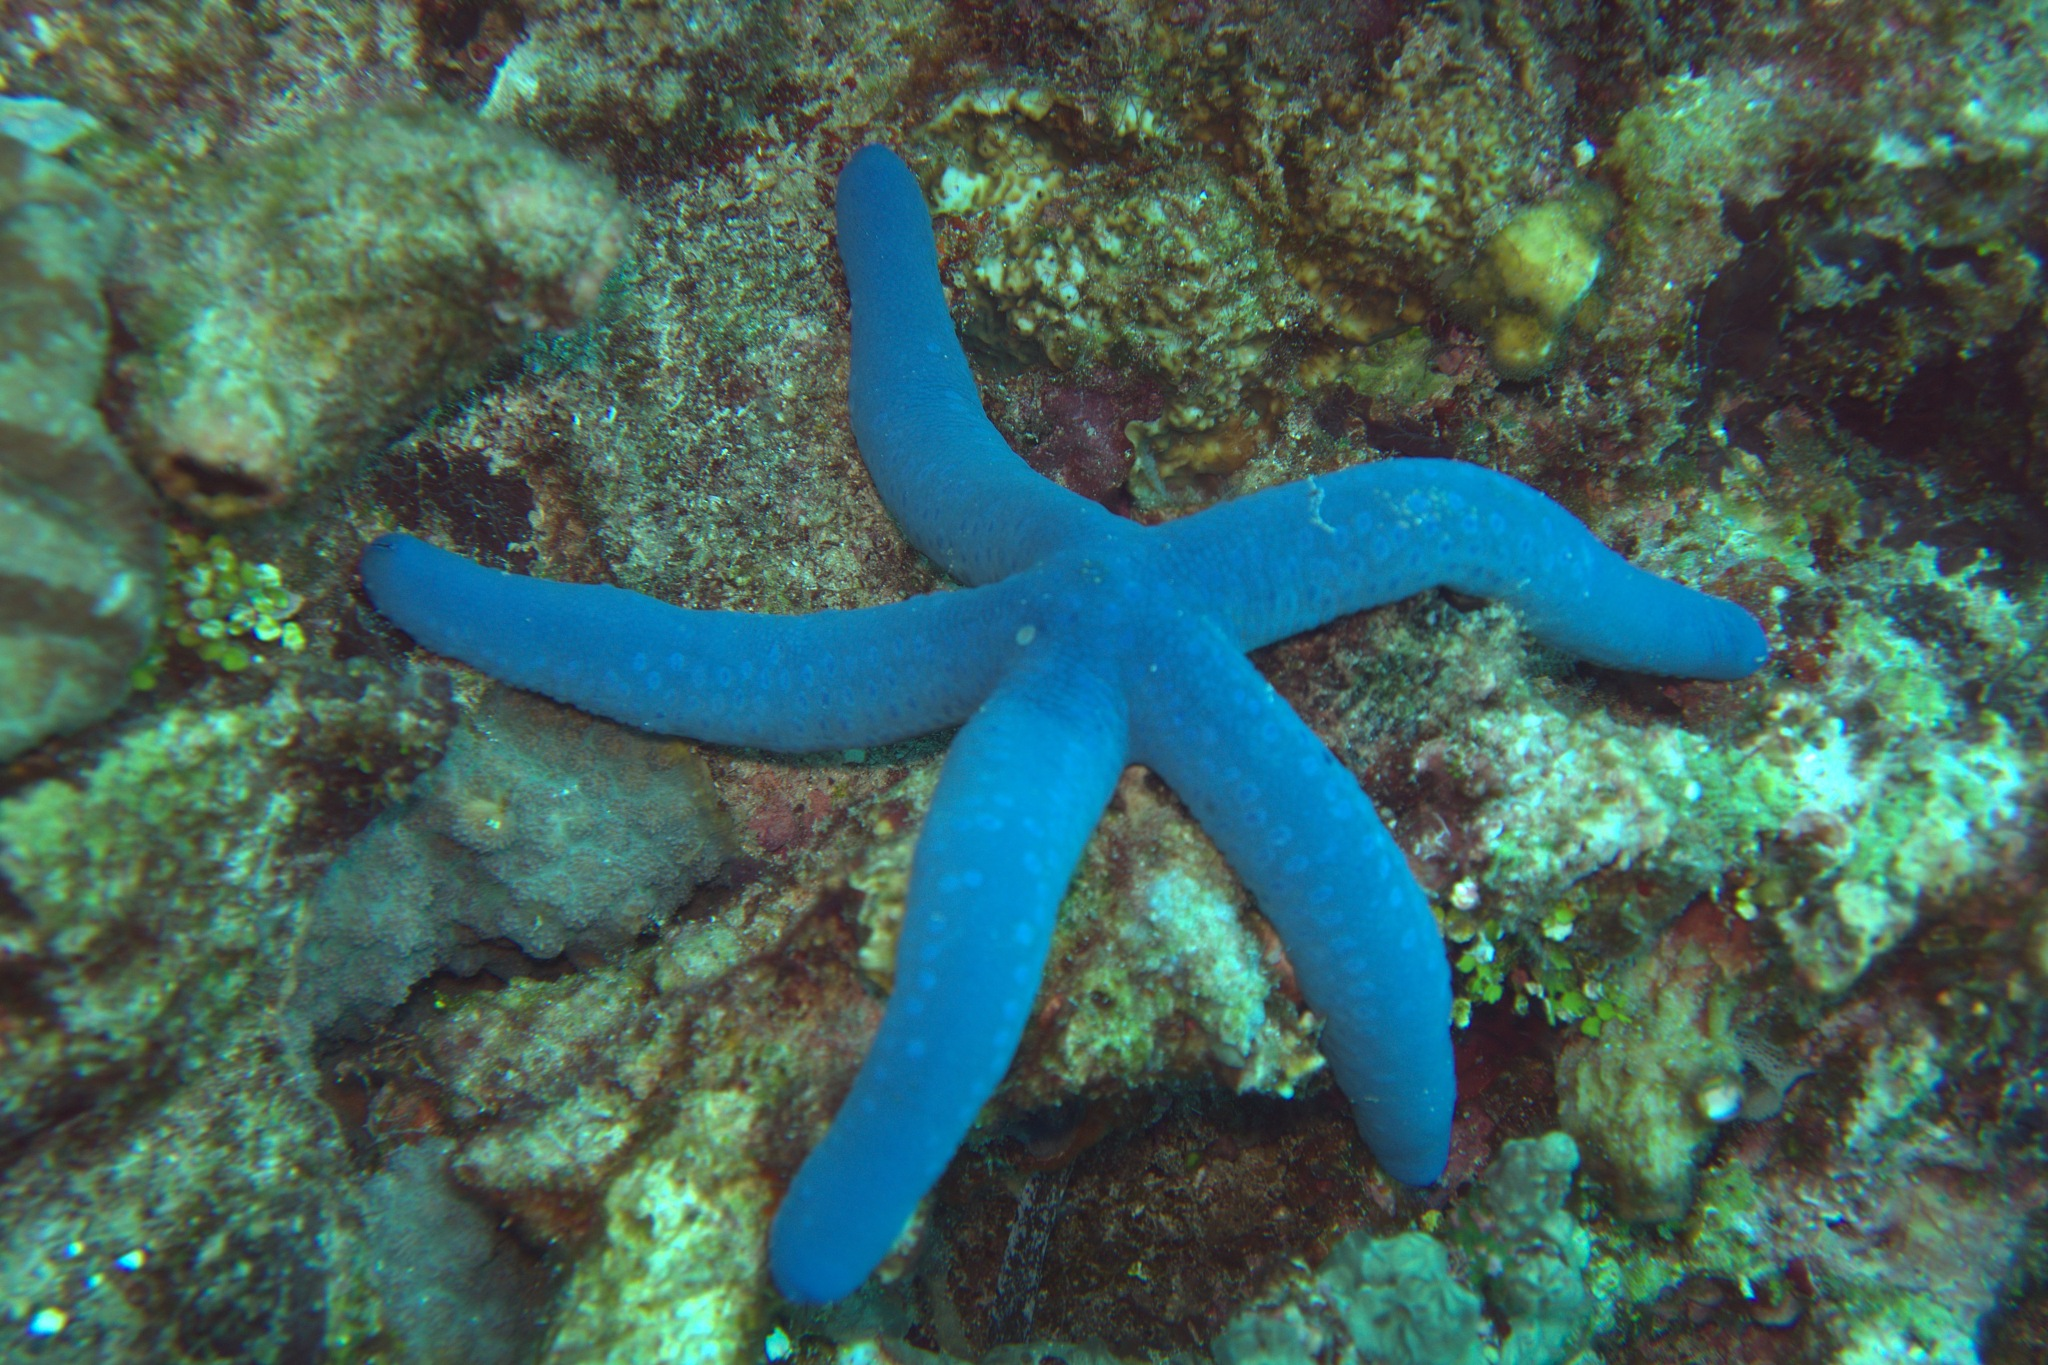 Blue star fish by Nico van Os Fine art